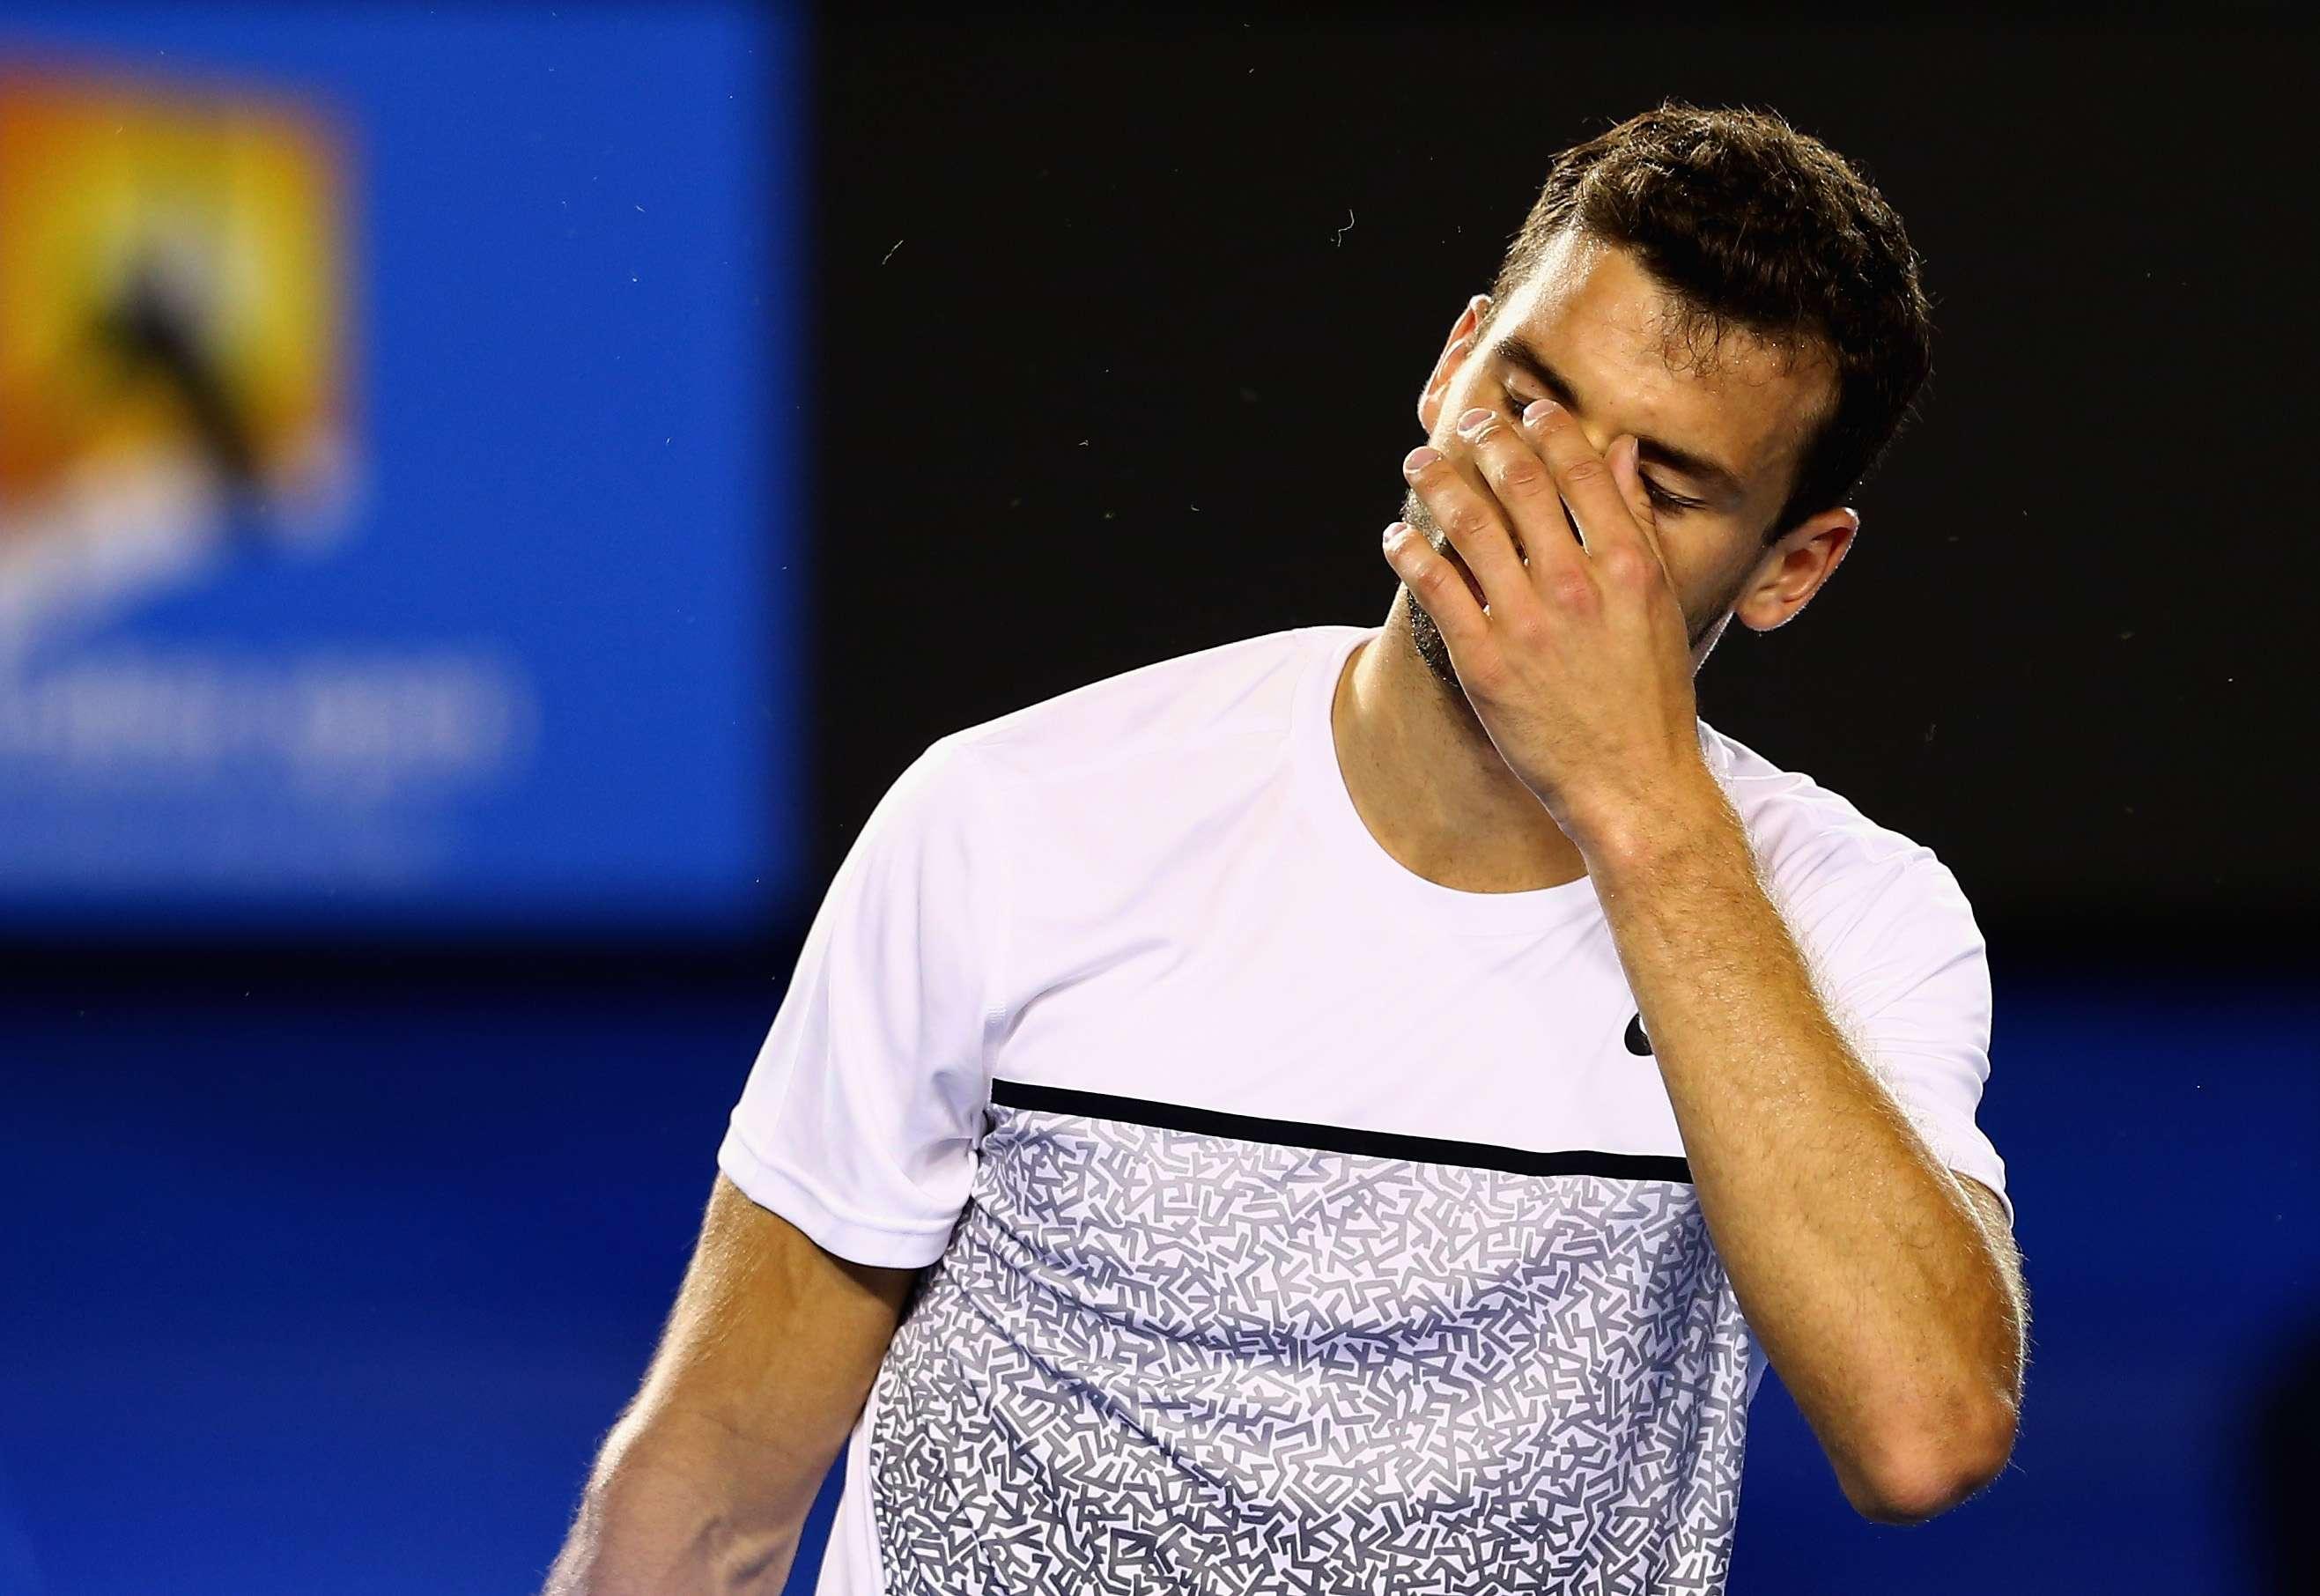 Así quedó la raqueta de Dimitrov. Foto: Getty Images